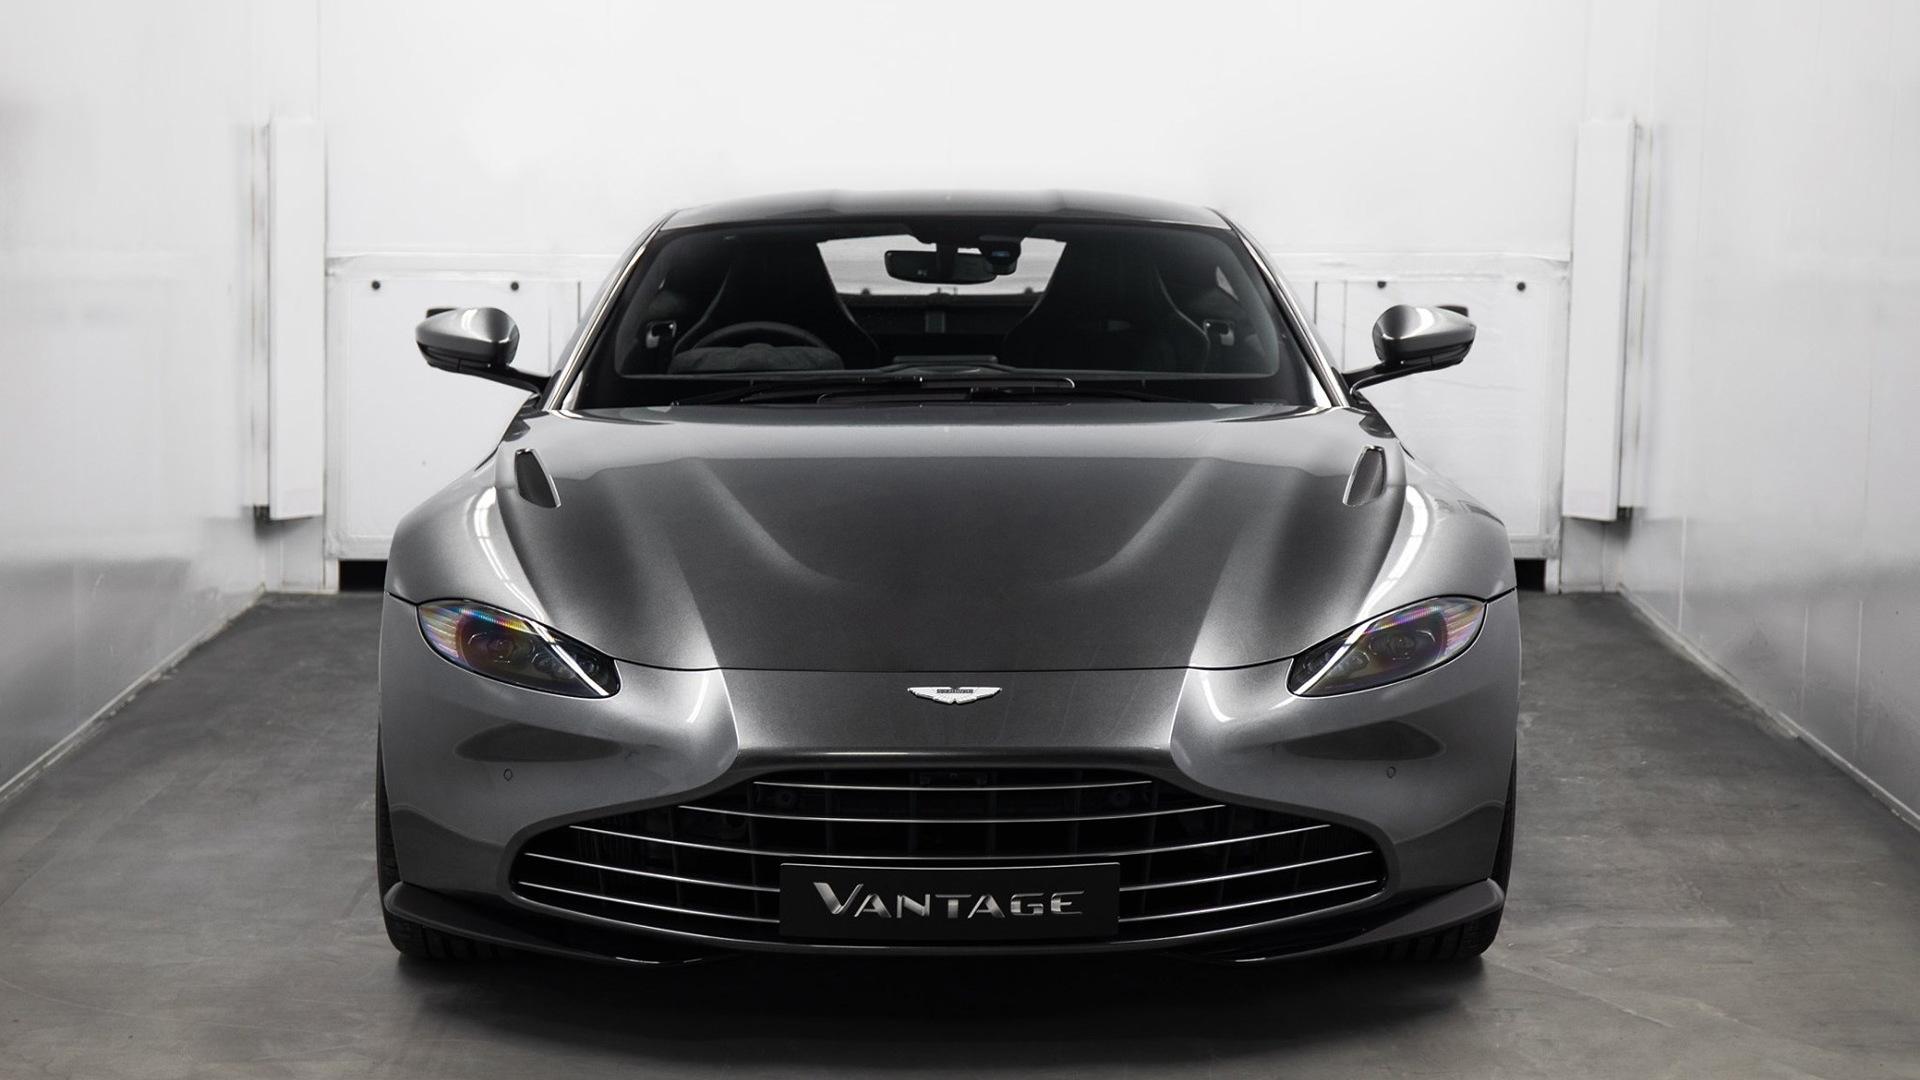 Aston Martin Vantage vane grille conversion